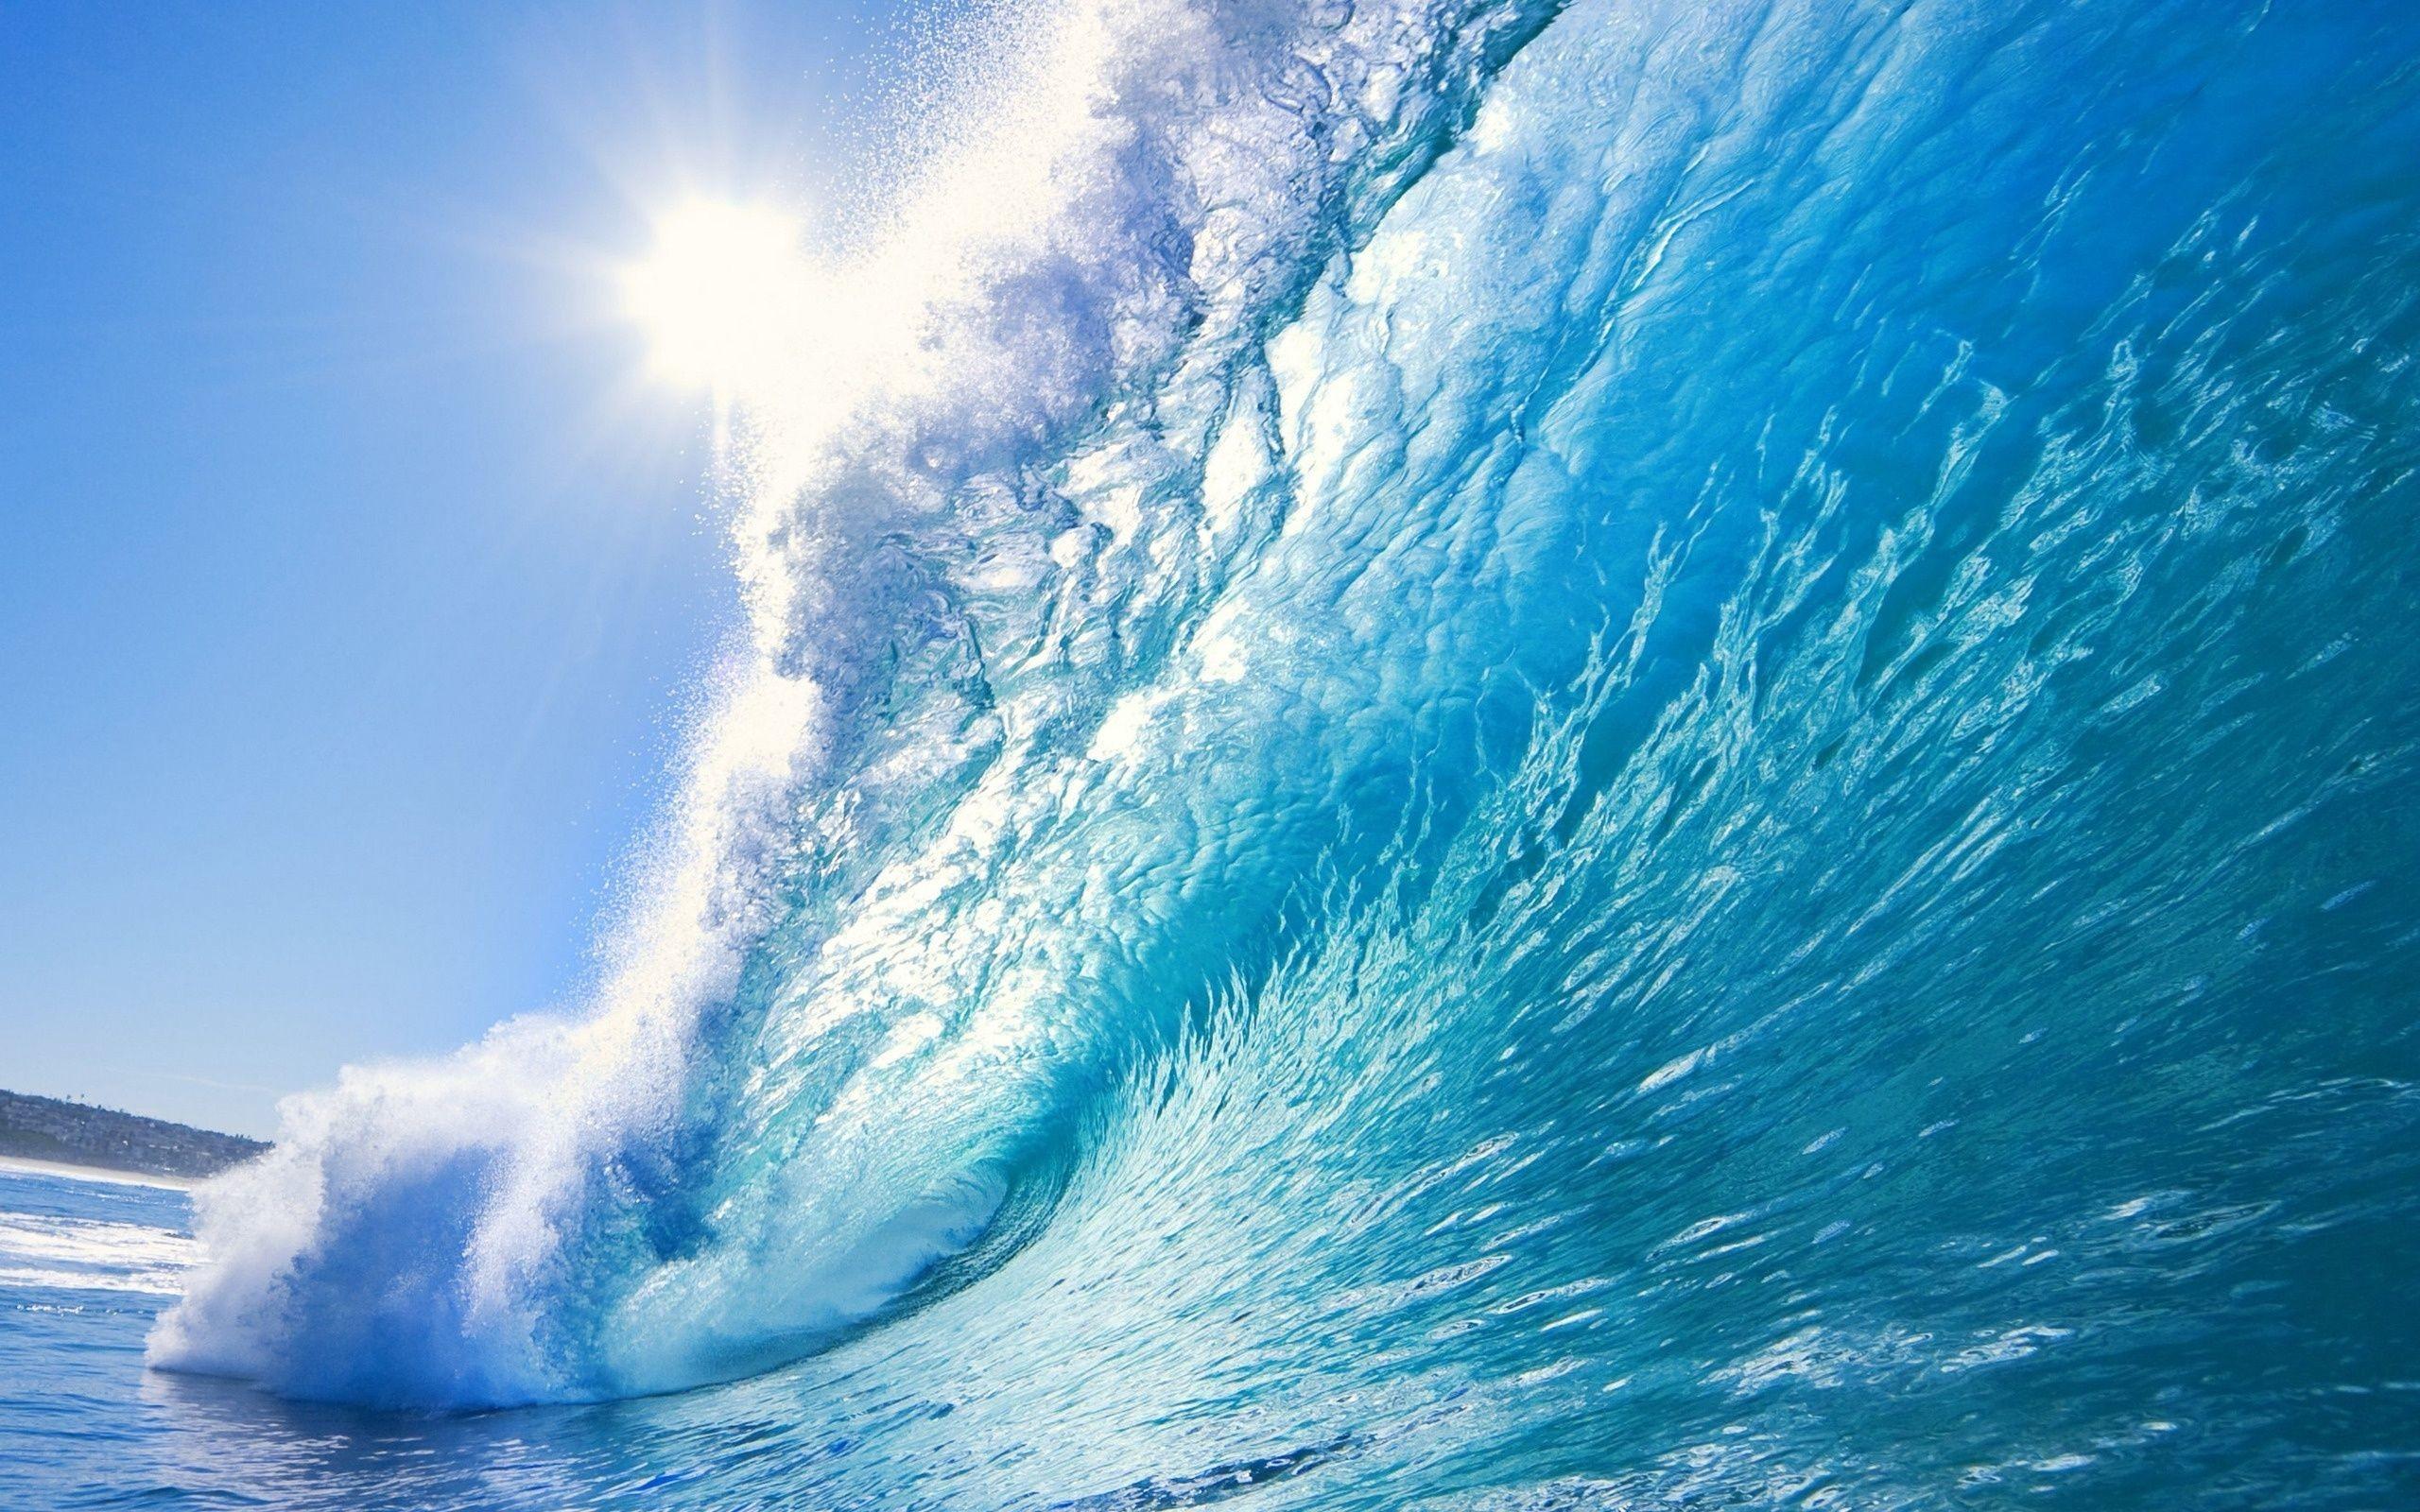 Ocean Wave Wallpaper HD